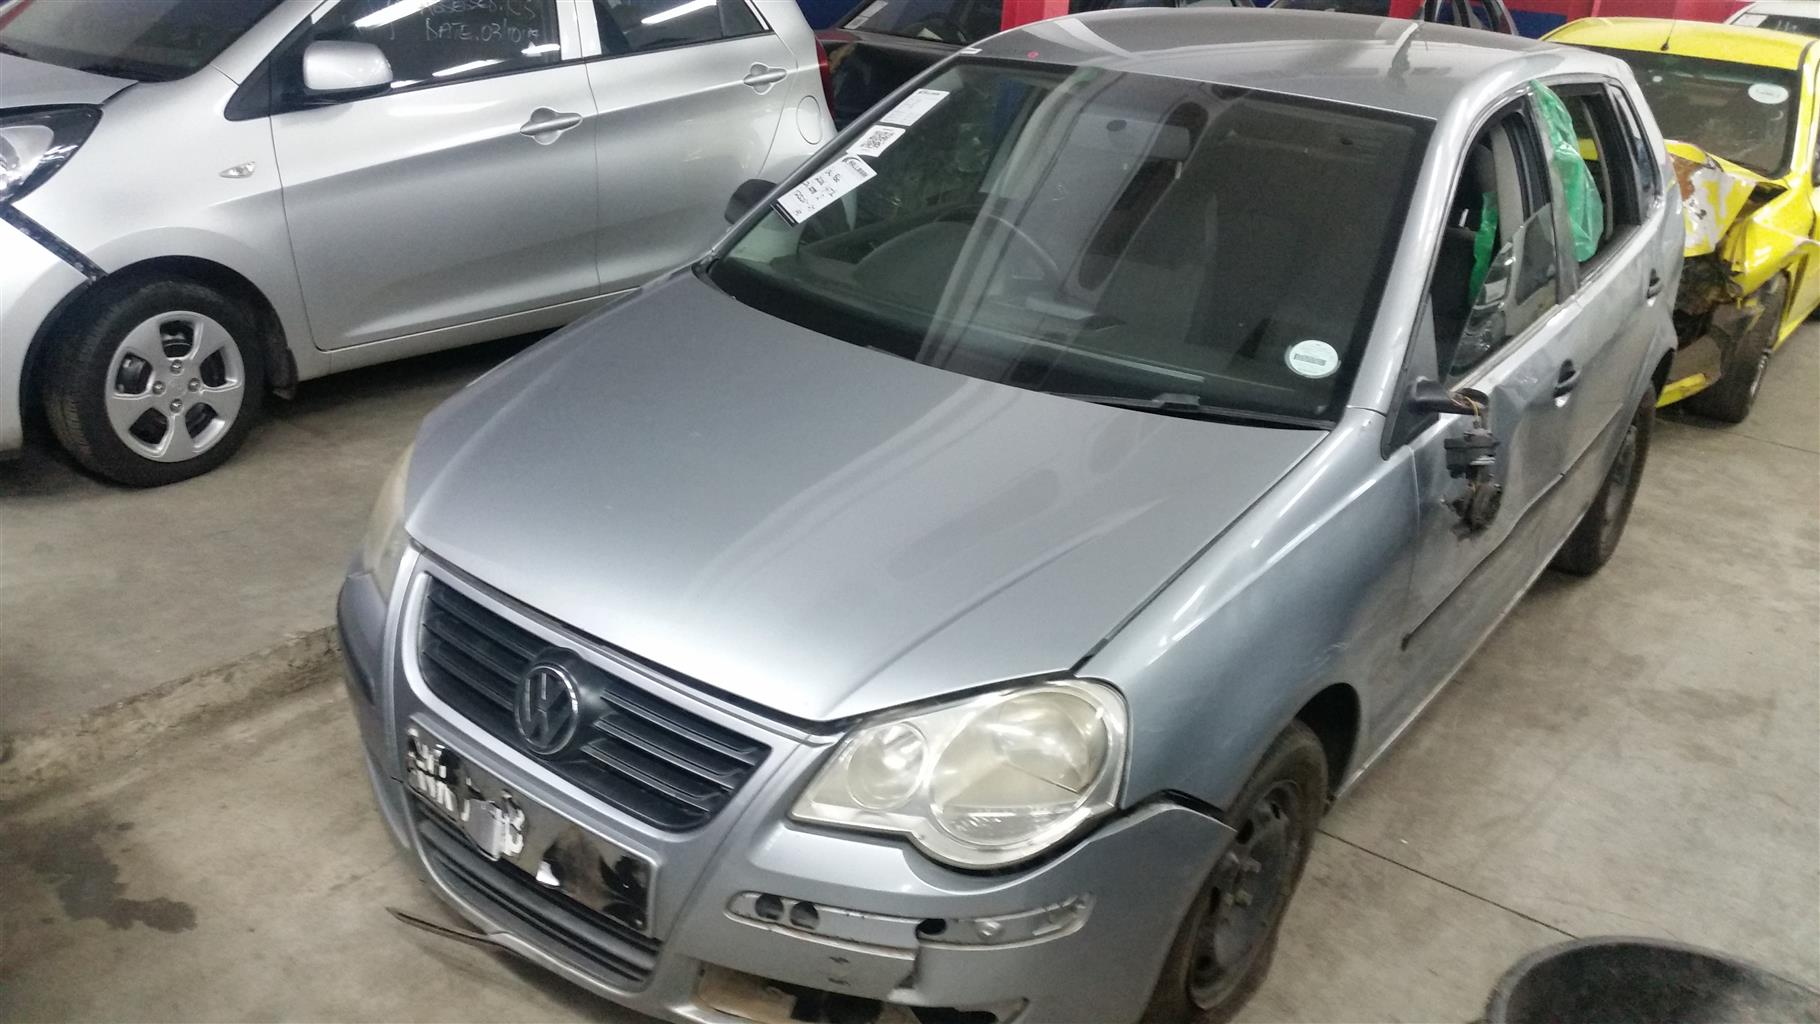 VW Polo 2006 1.4 T/L (REF IW25378)